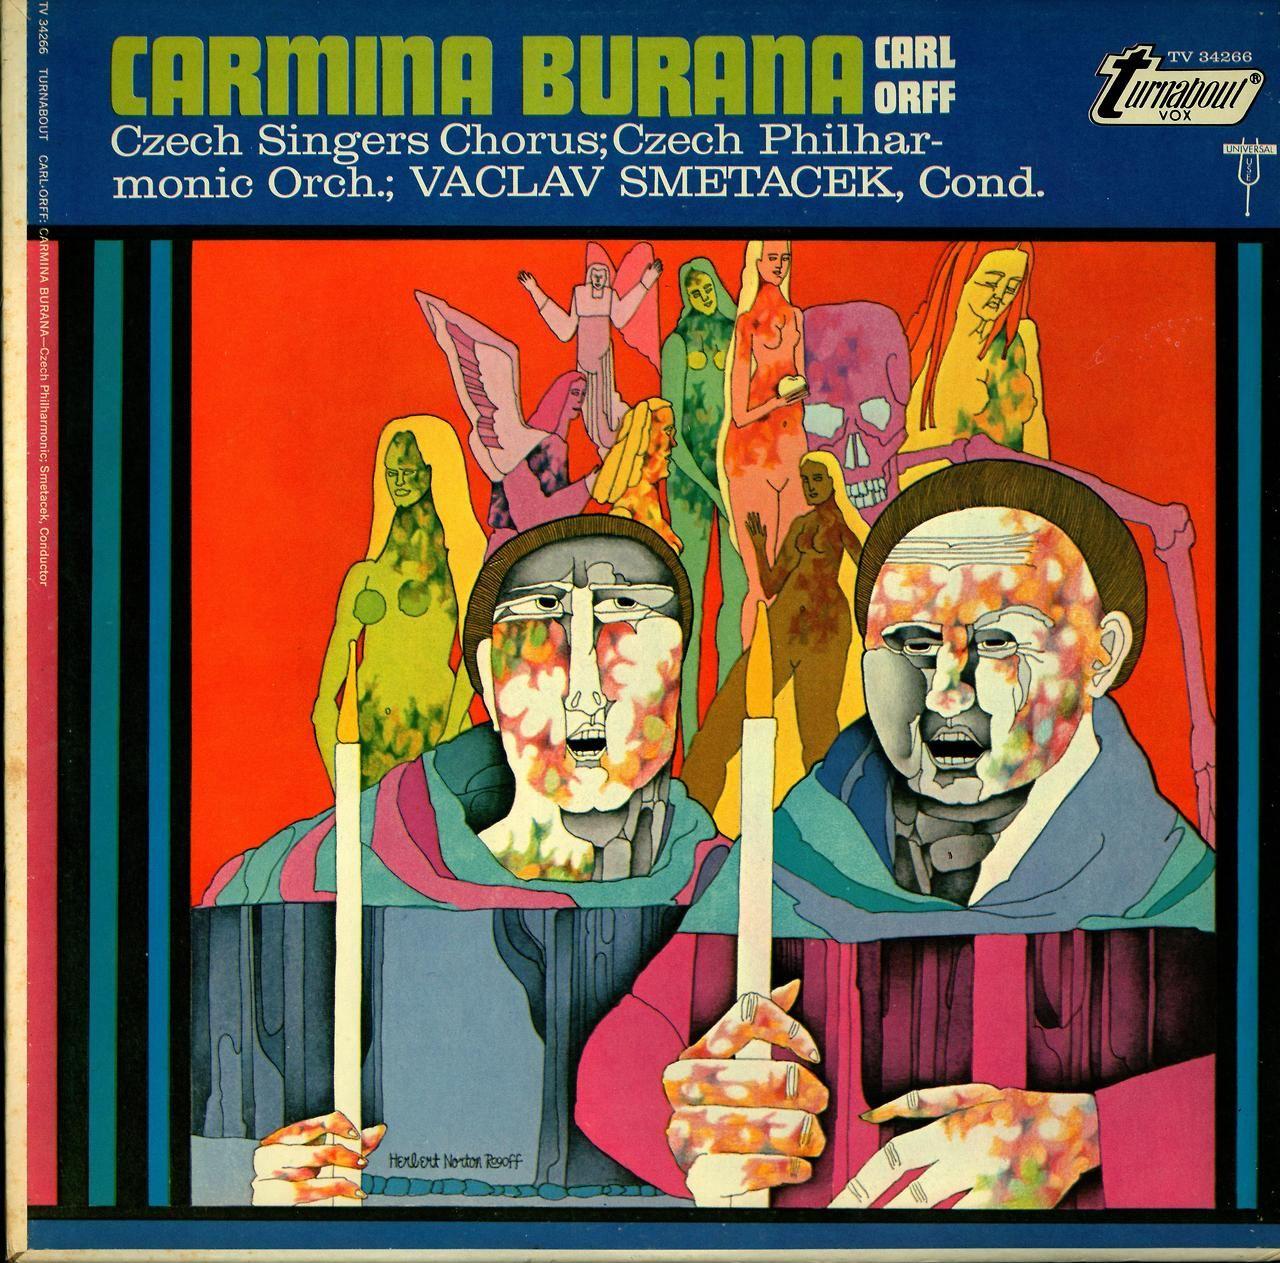 Orff- Carmina Burana  Czech Singers:Czech Philharmonic Orchestra, Vaclav Smetacek, cond.  Turnabout:Vox Records TV 34266  Art by Herbert Rogoff